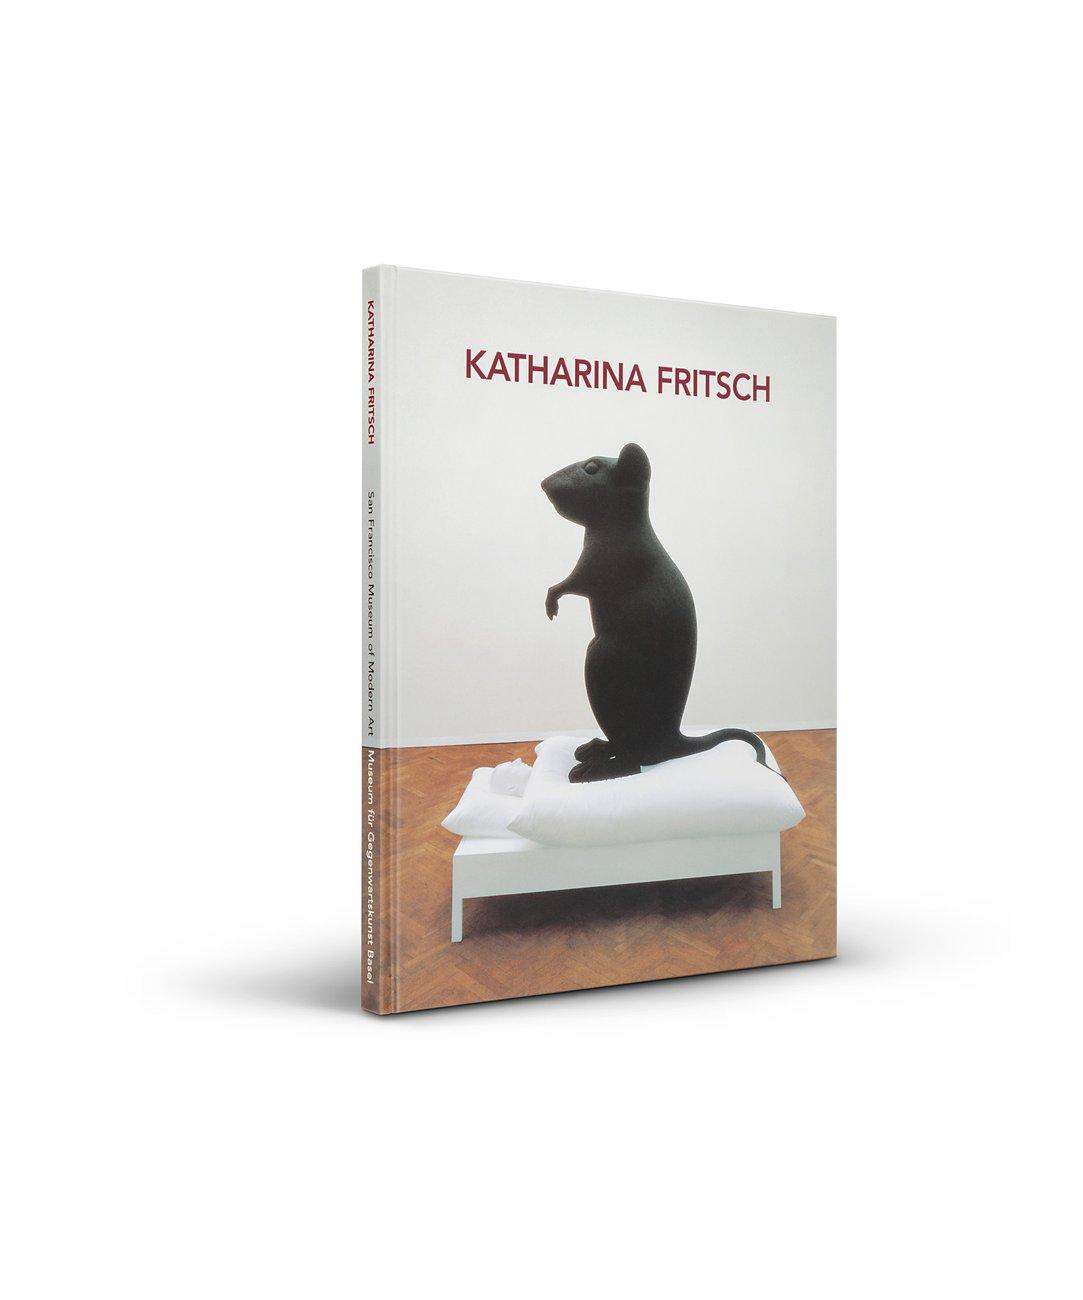 Katharina Fritsch, cover